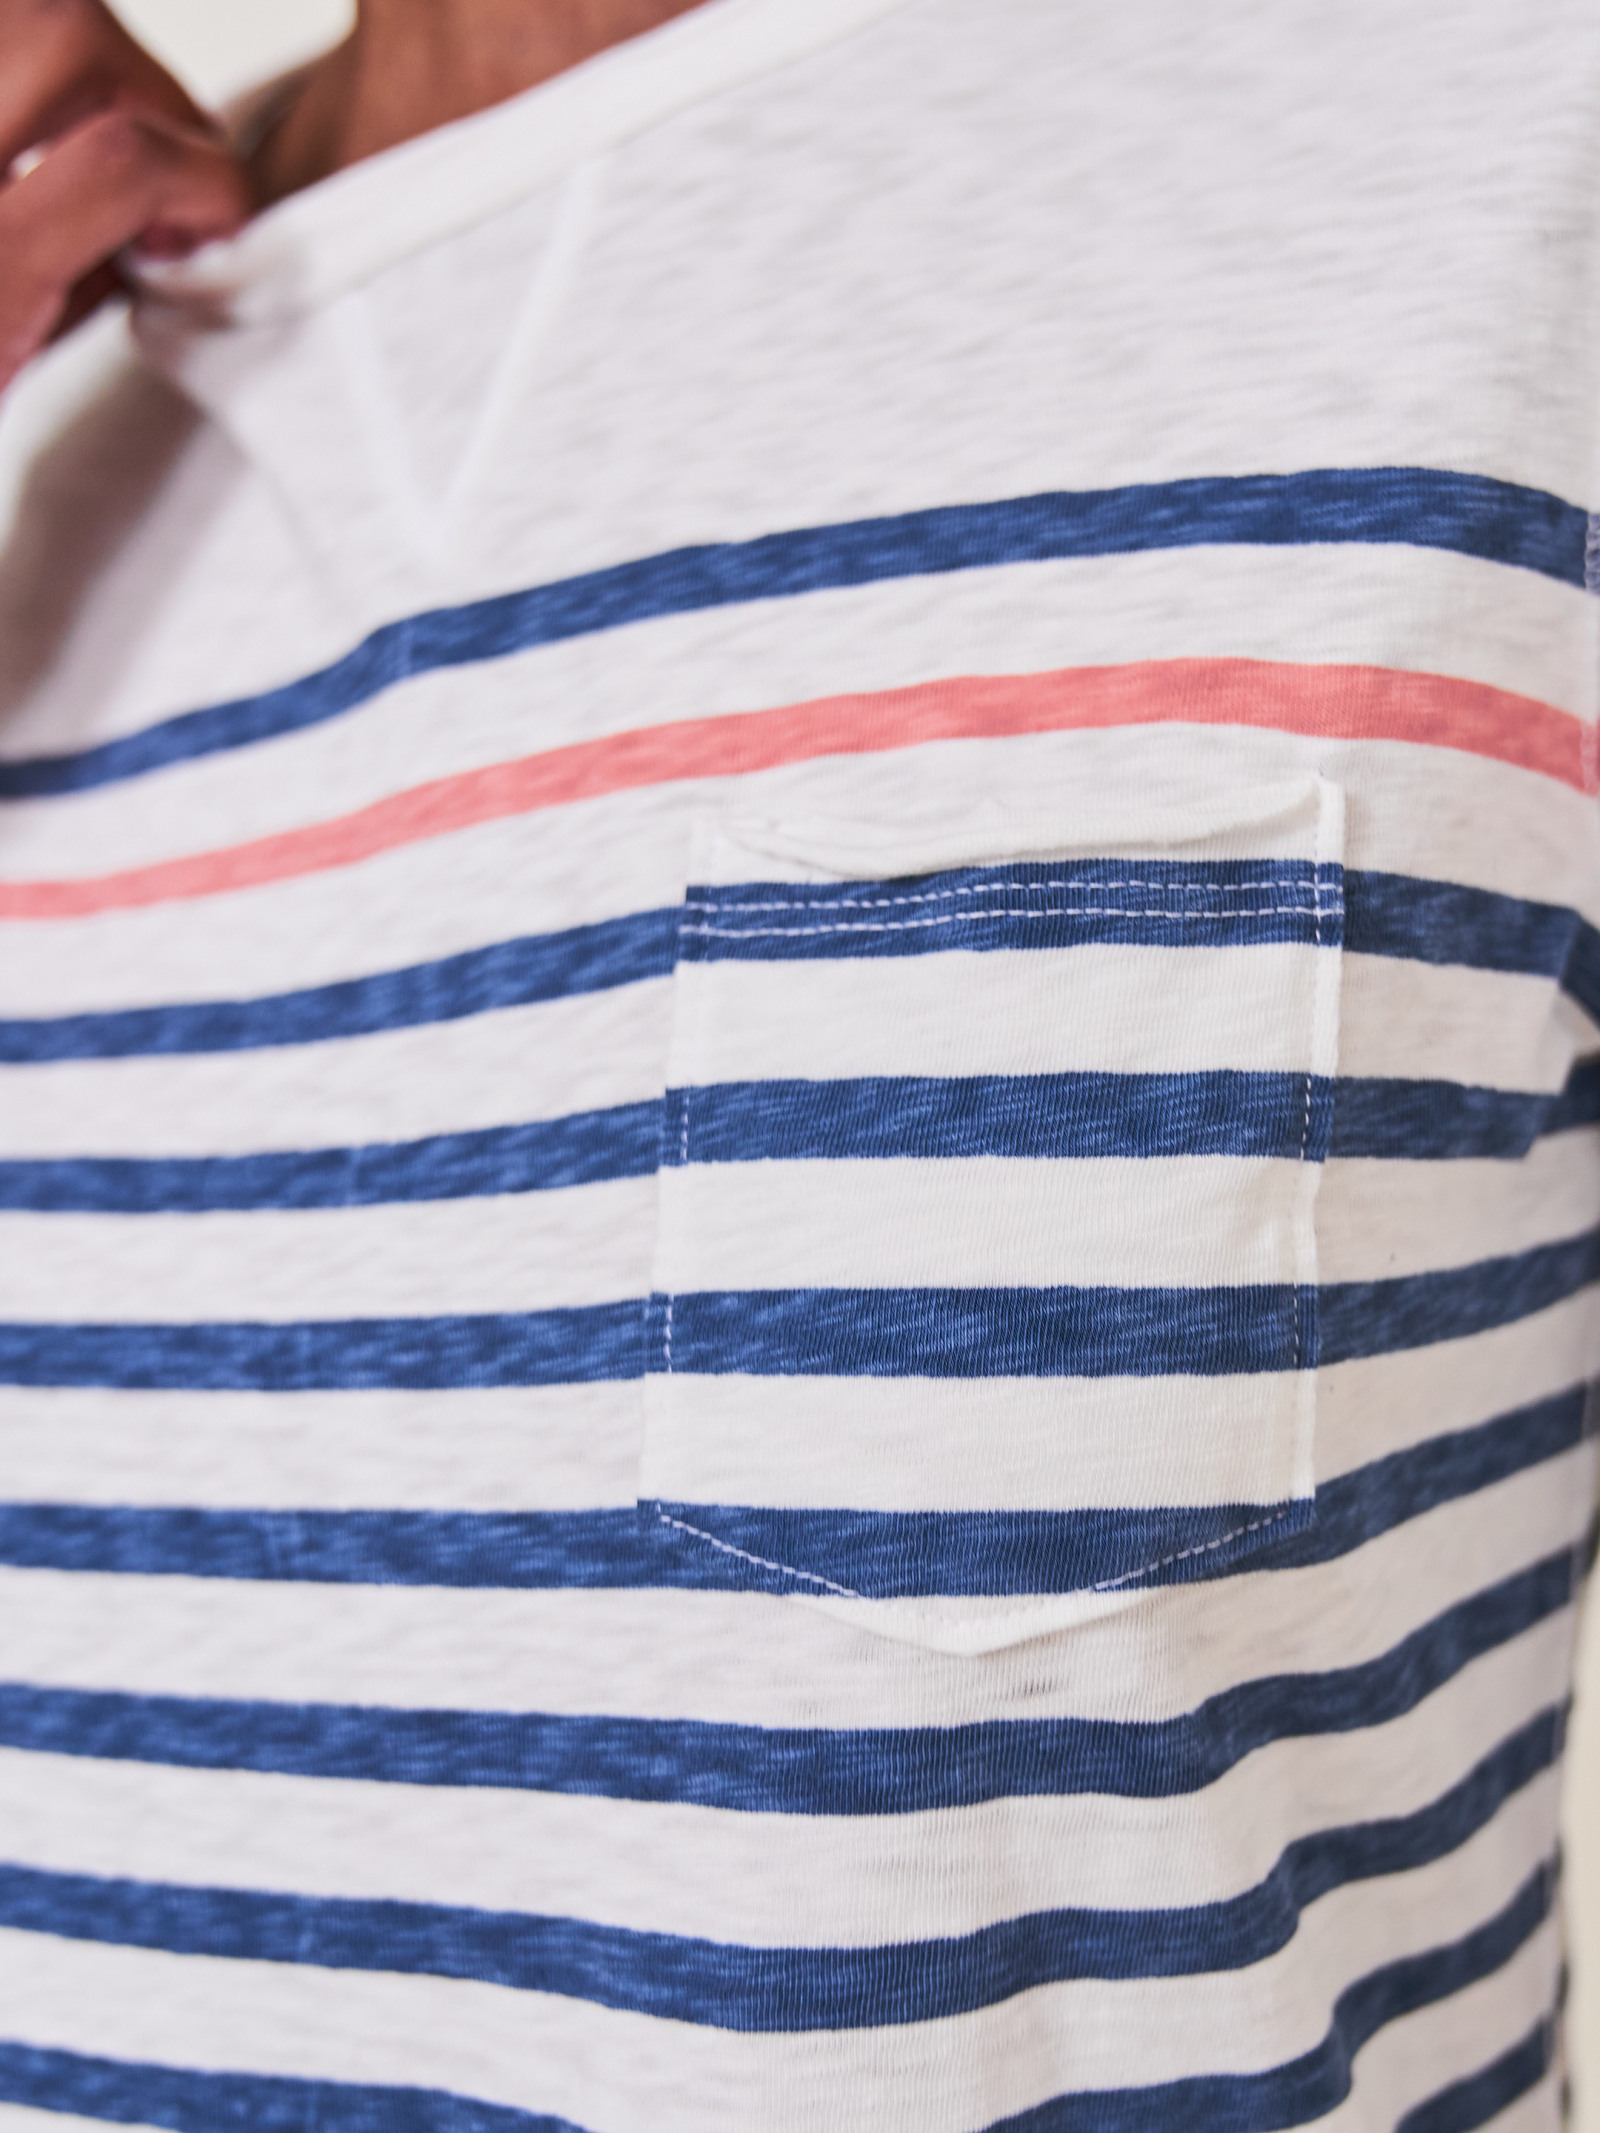 White Stuff | Petunia Pocket T-Shirt Blue Striped